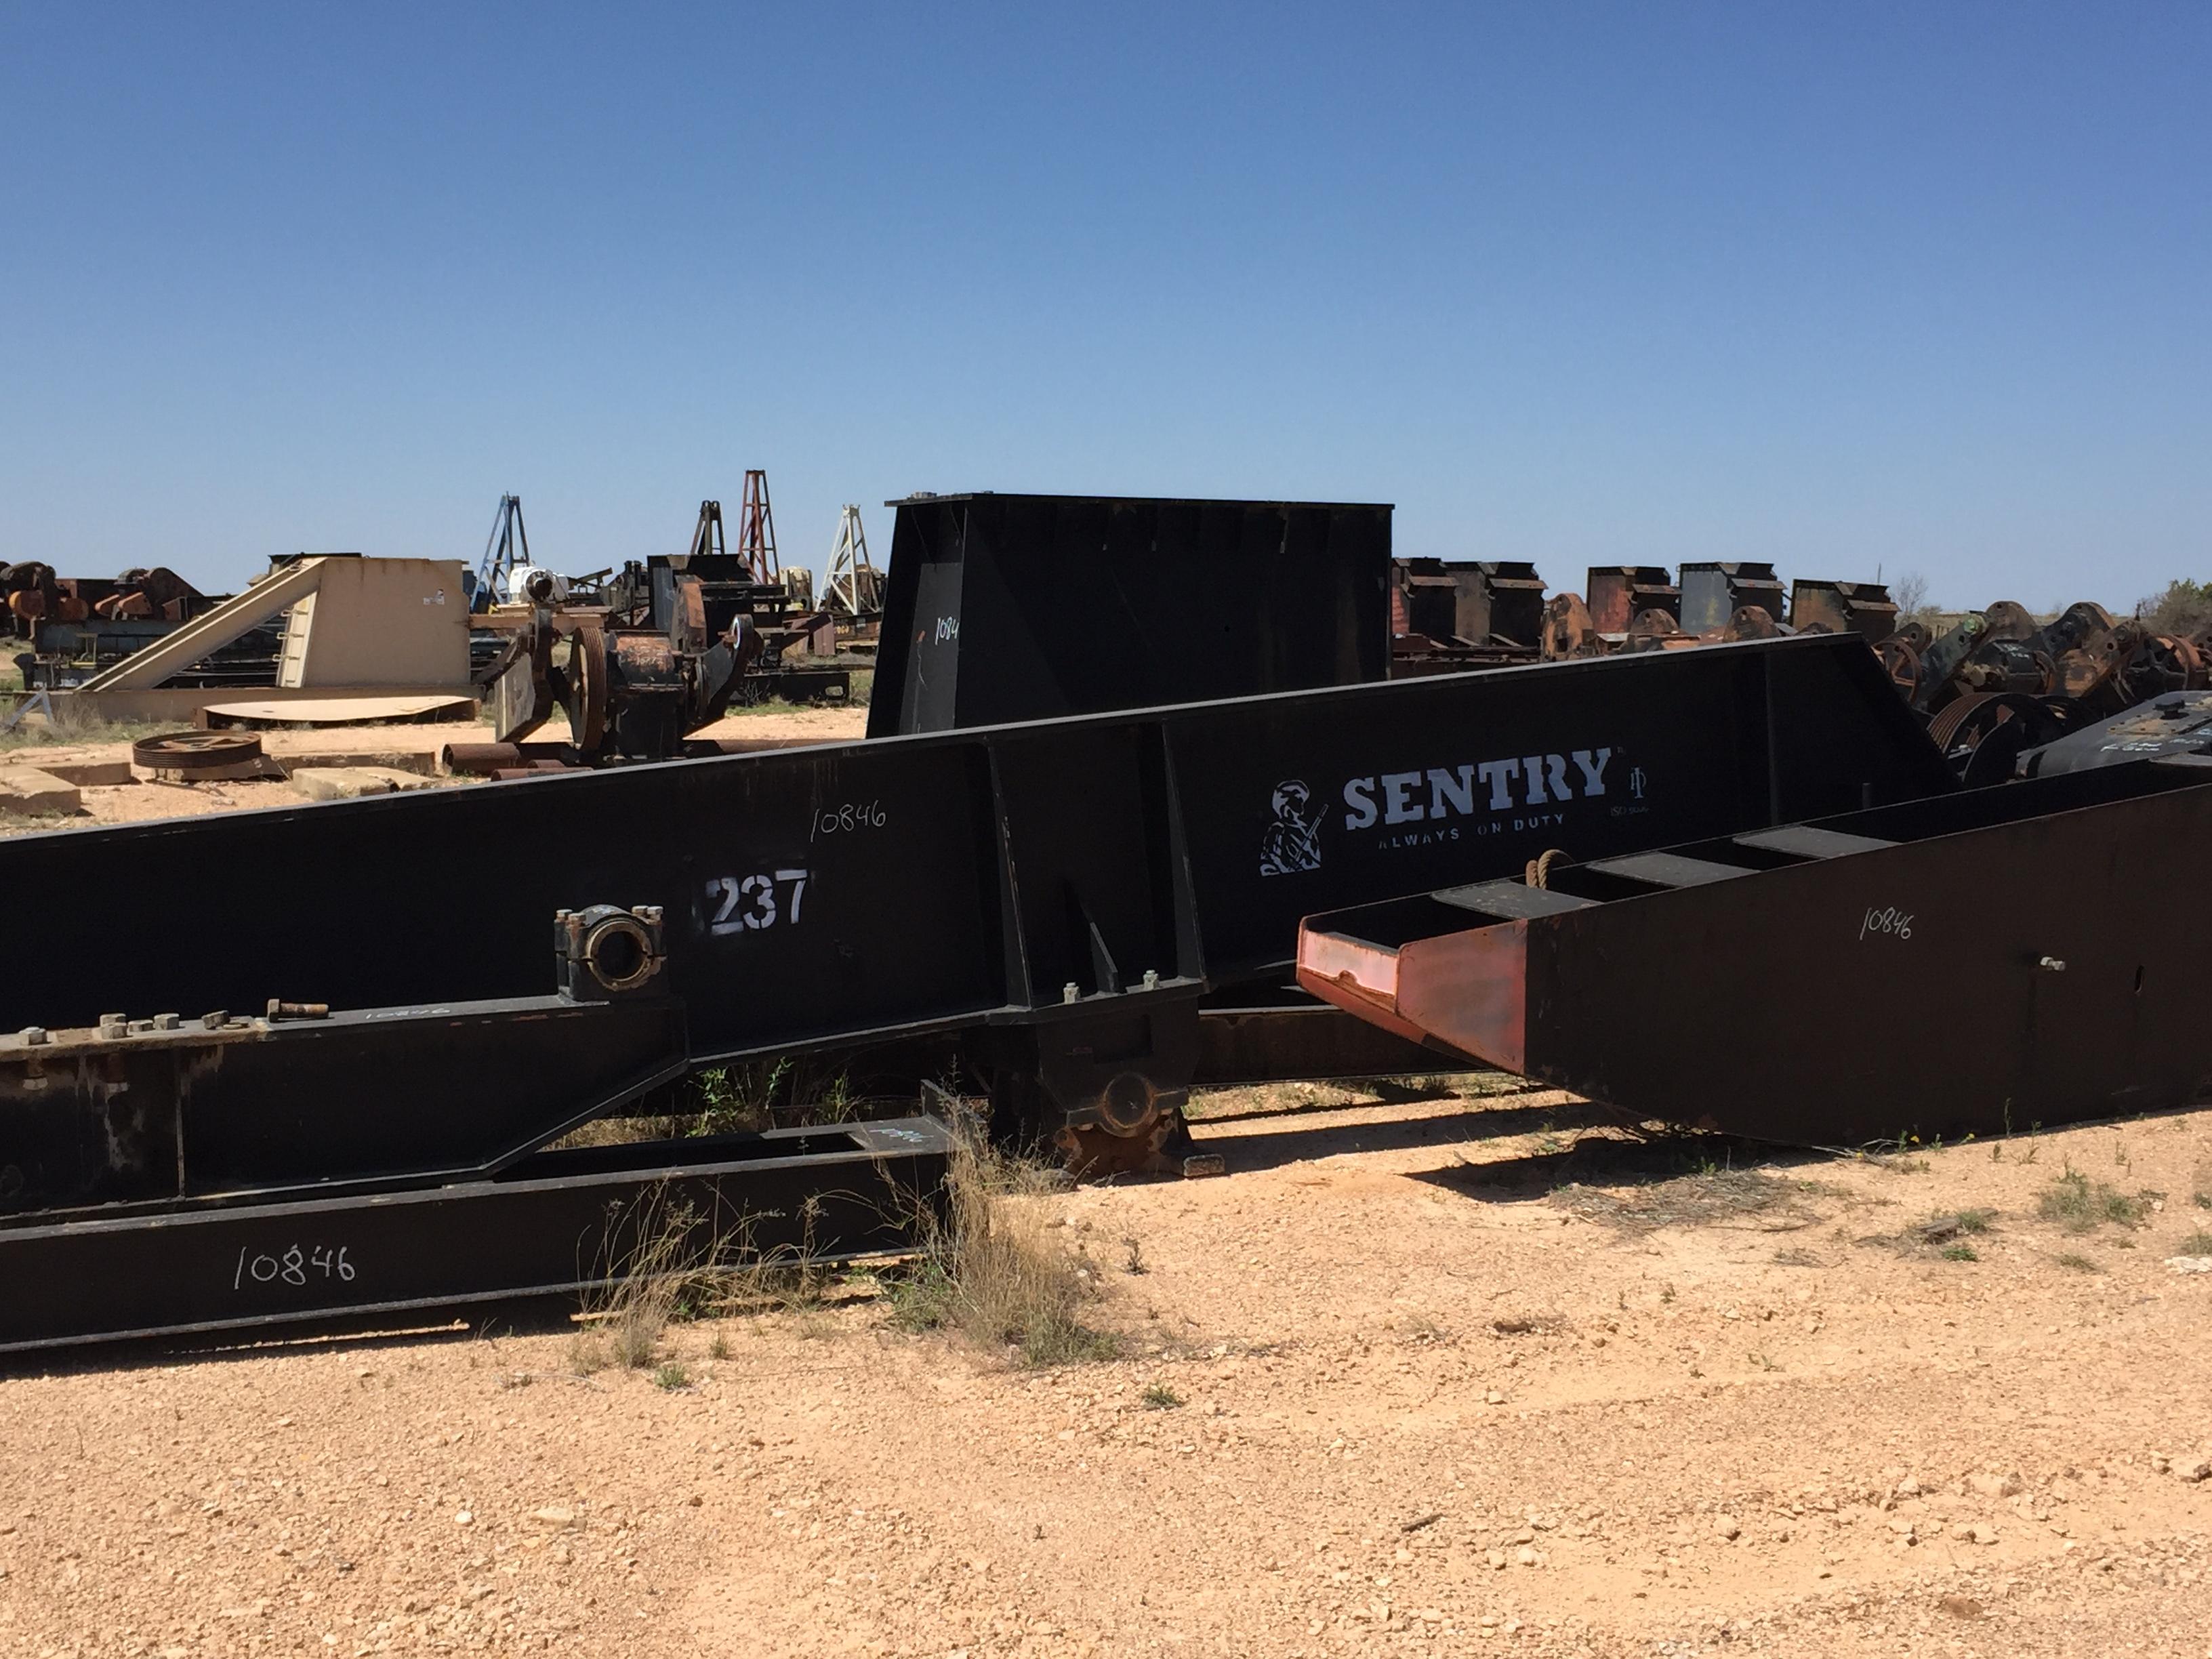 Sentry 456-305-168